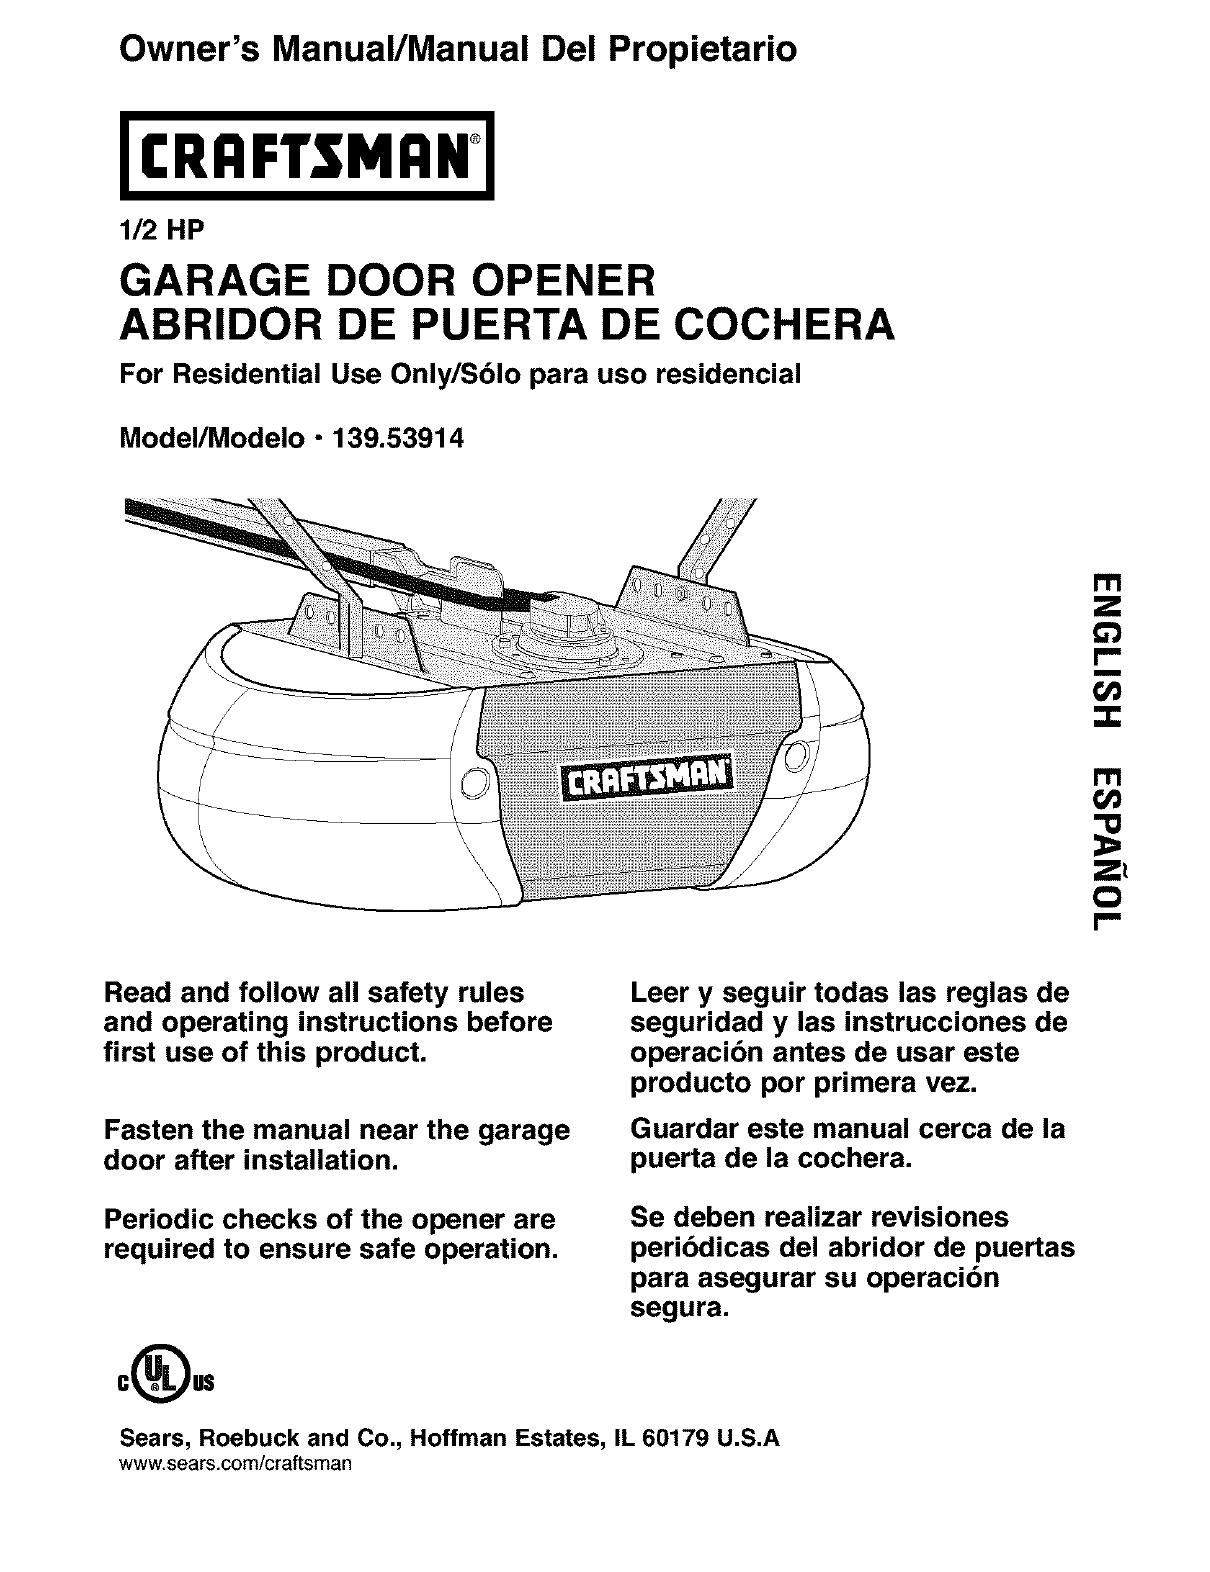 Craftsman 13953914 User Manual Garage Door Opener Manuals And Guides